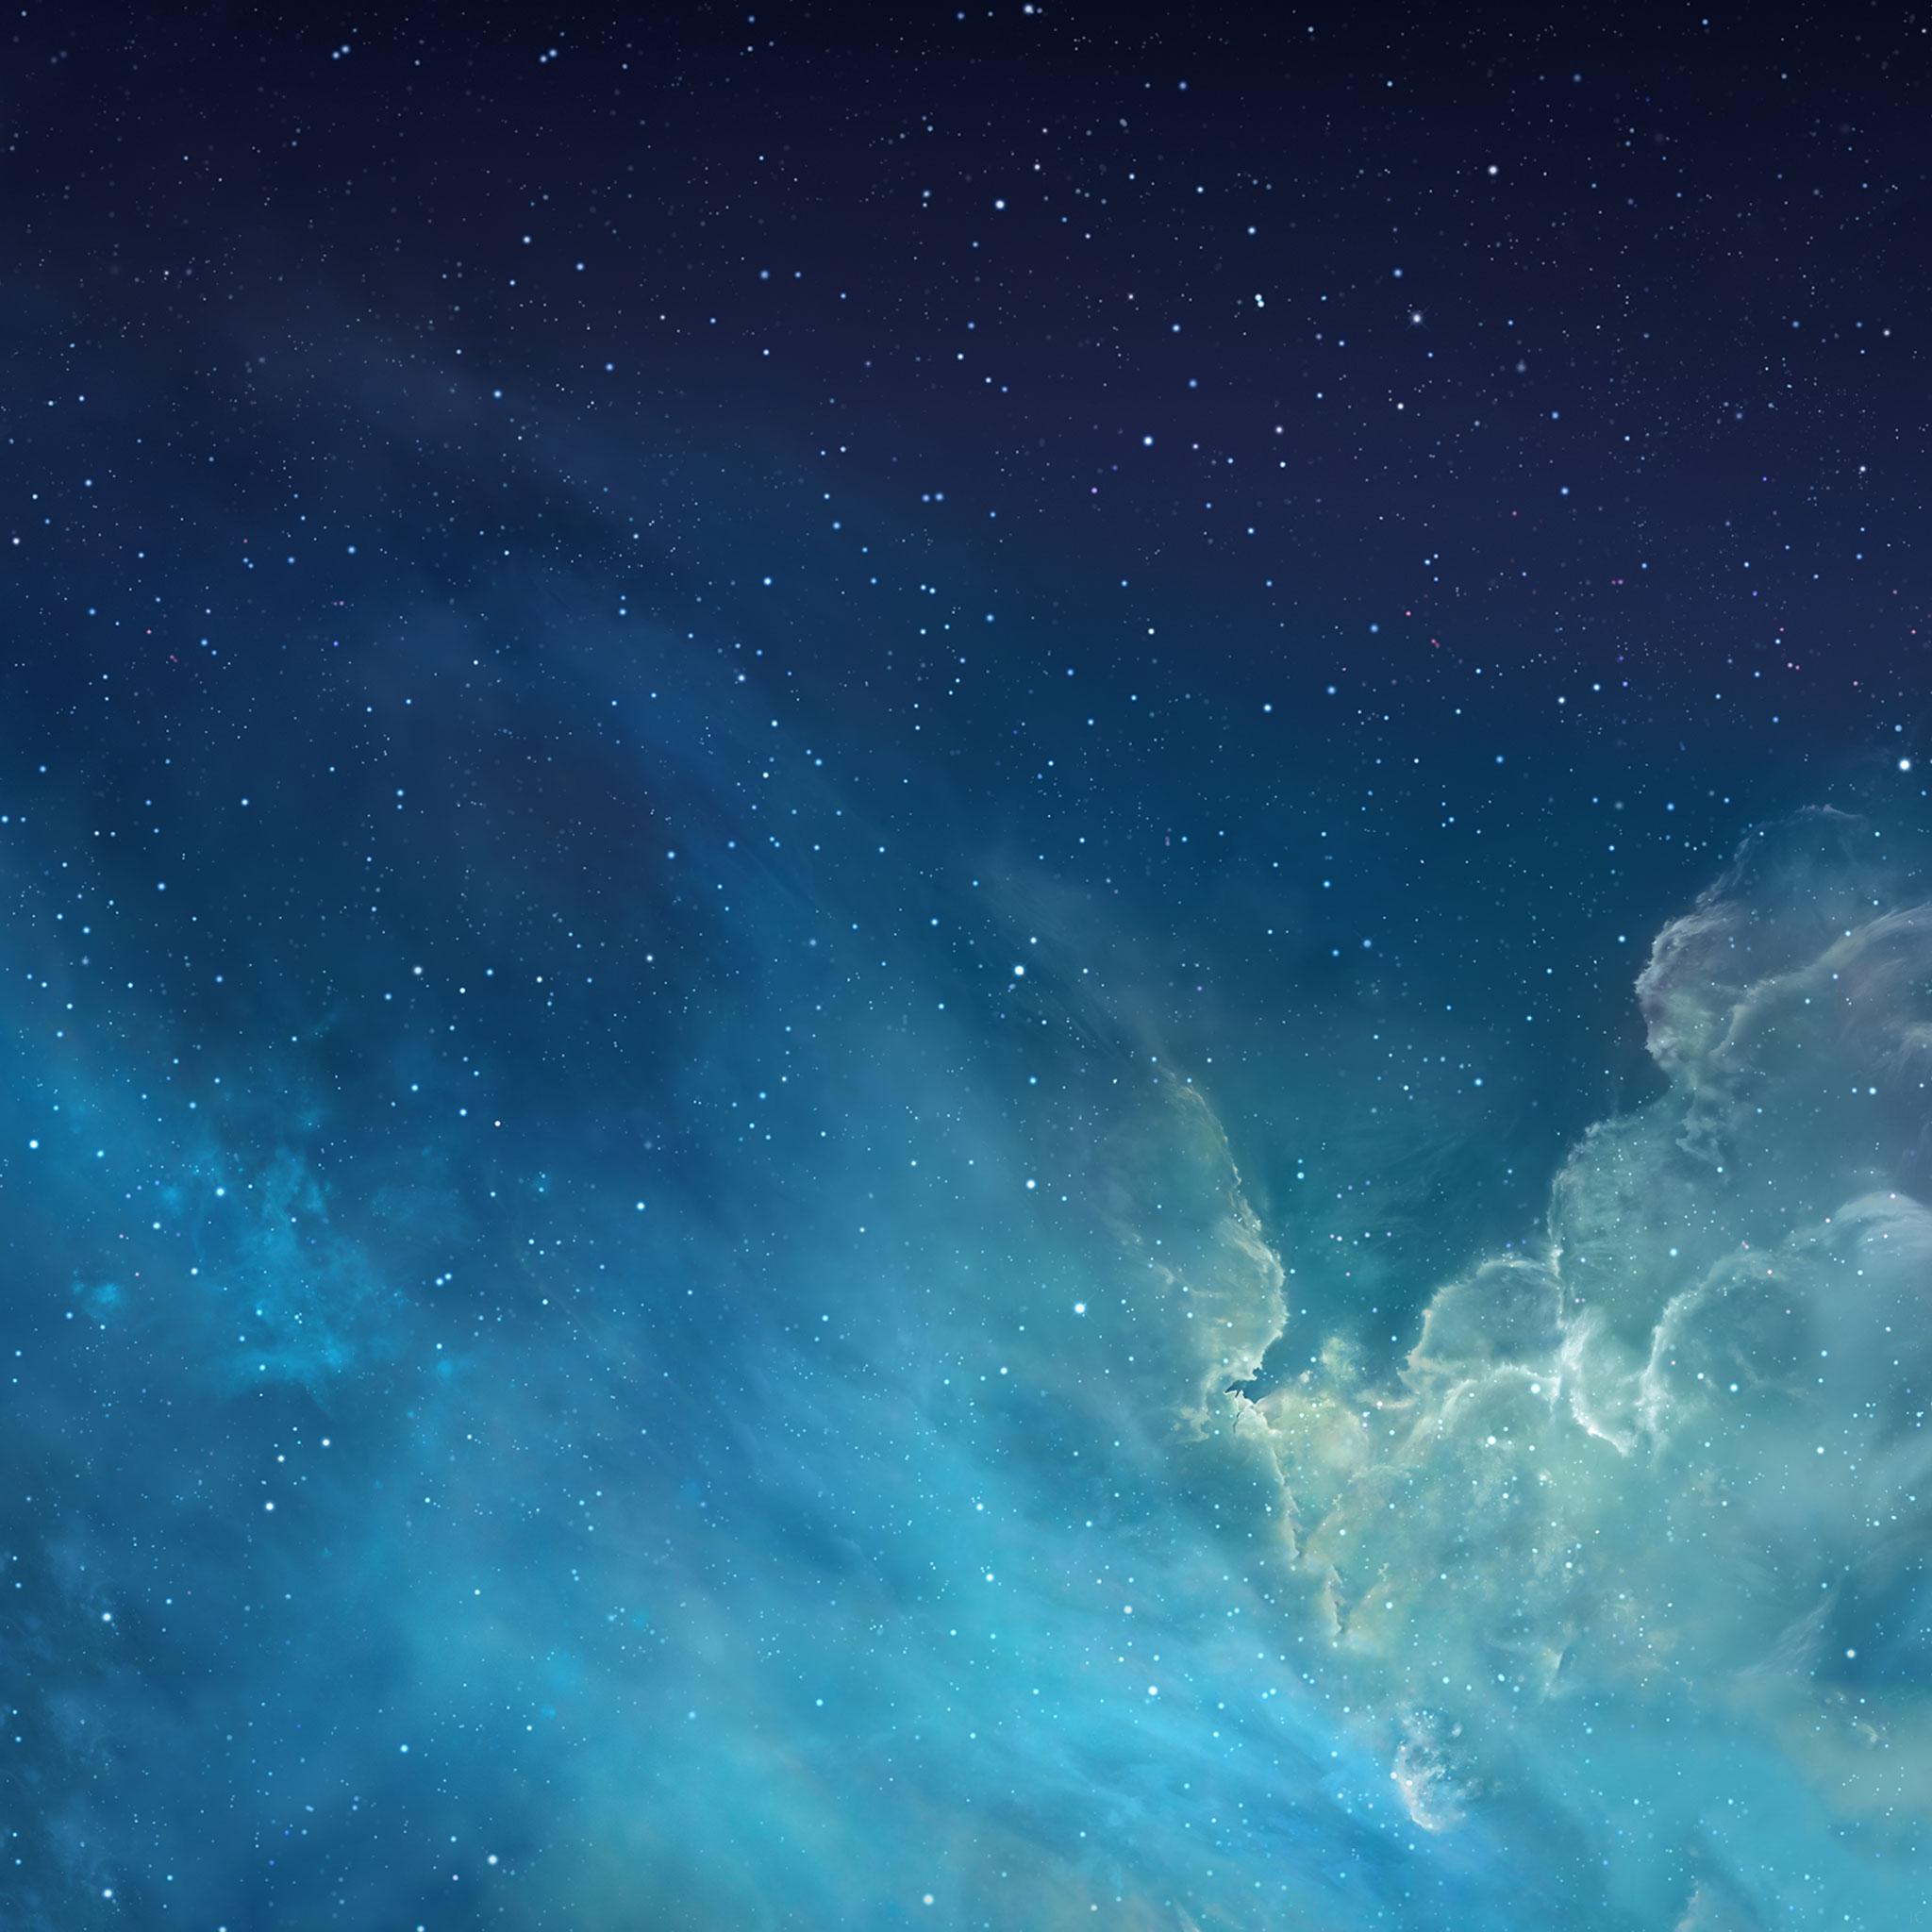 wallpaper] Baixe alguns fundos de tela do iOS 7 no seu iPhone iPod 2048x2048